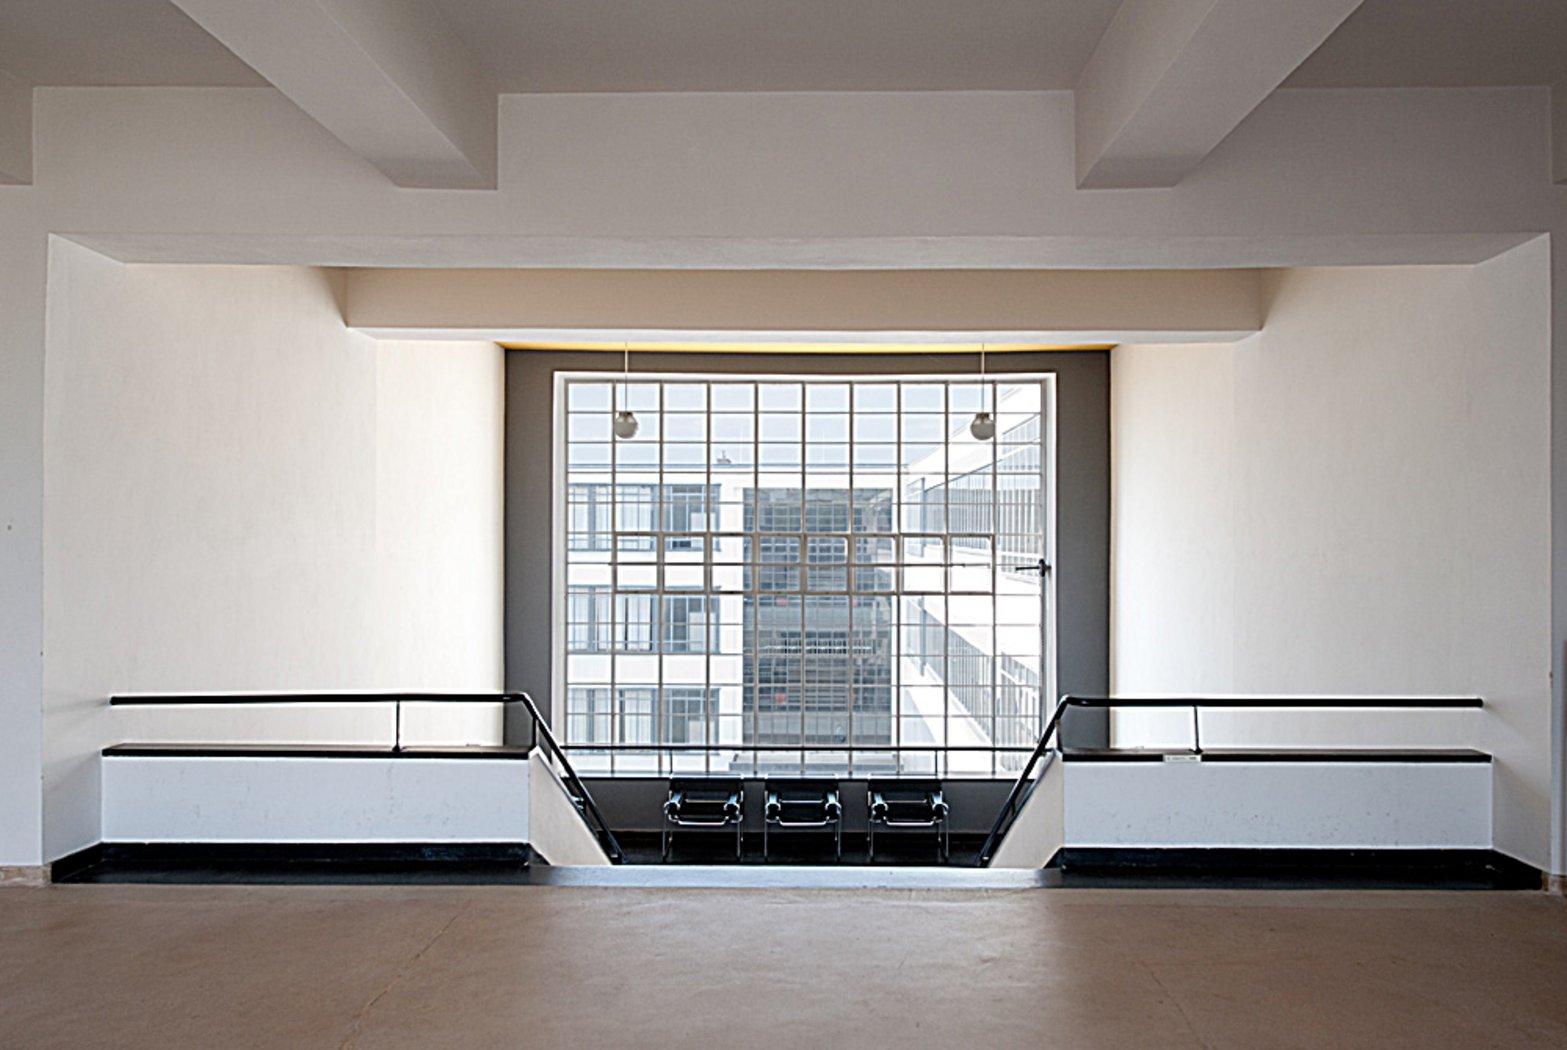 Bauhaus Building By Walter Gropius 192526 Bauhaus Building